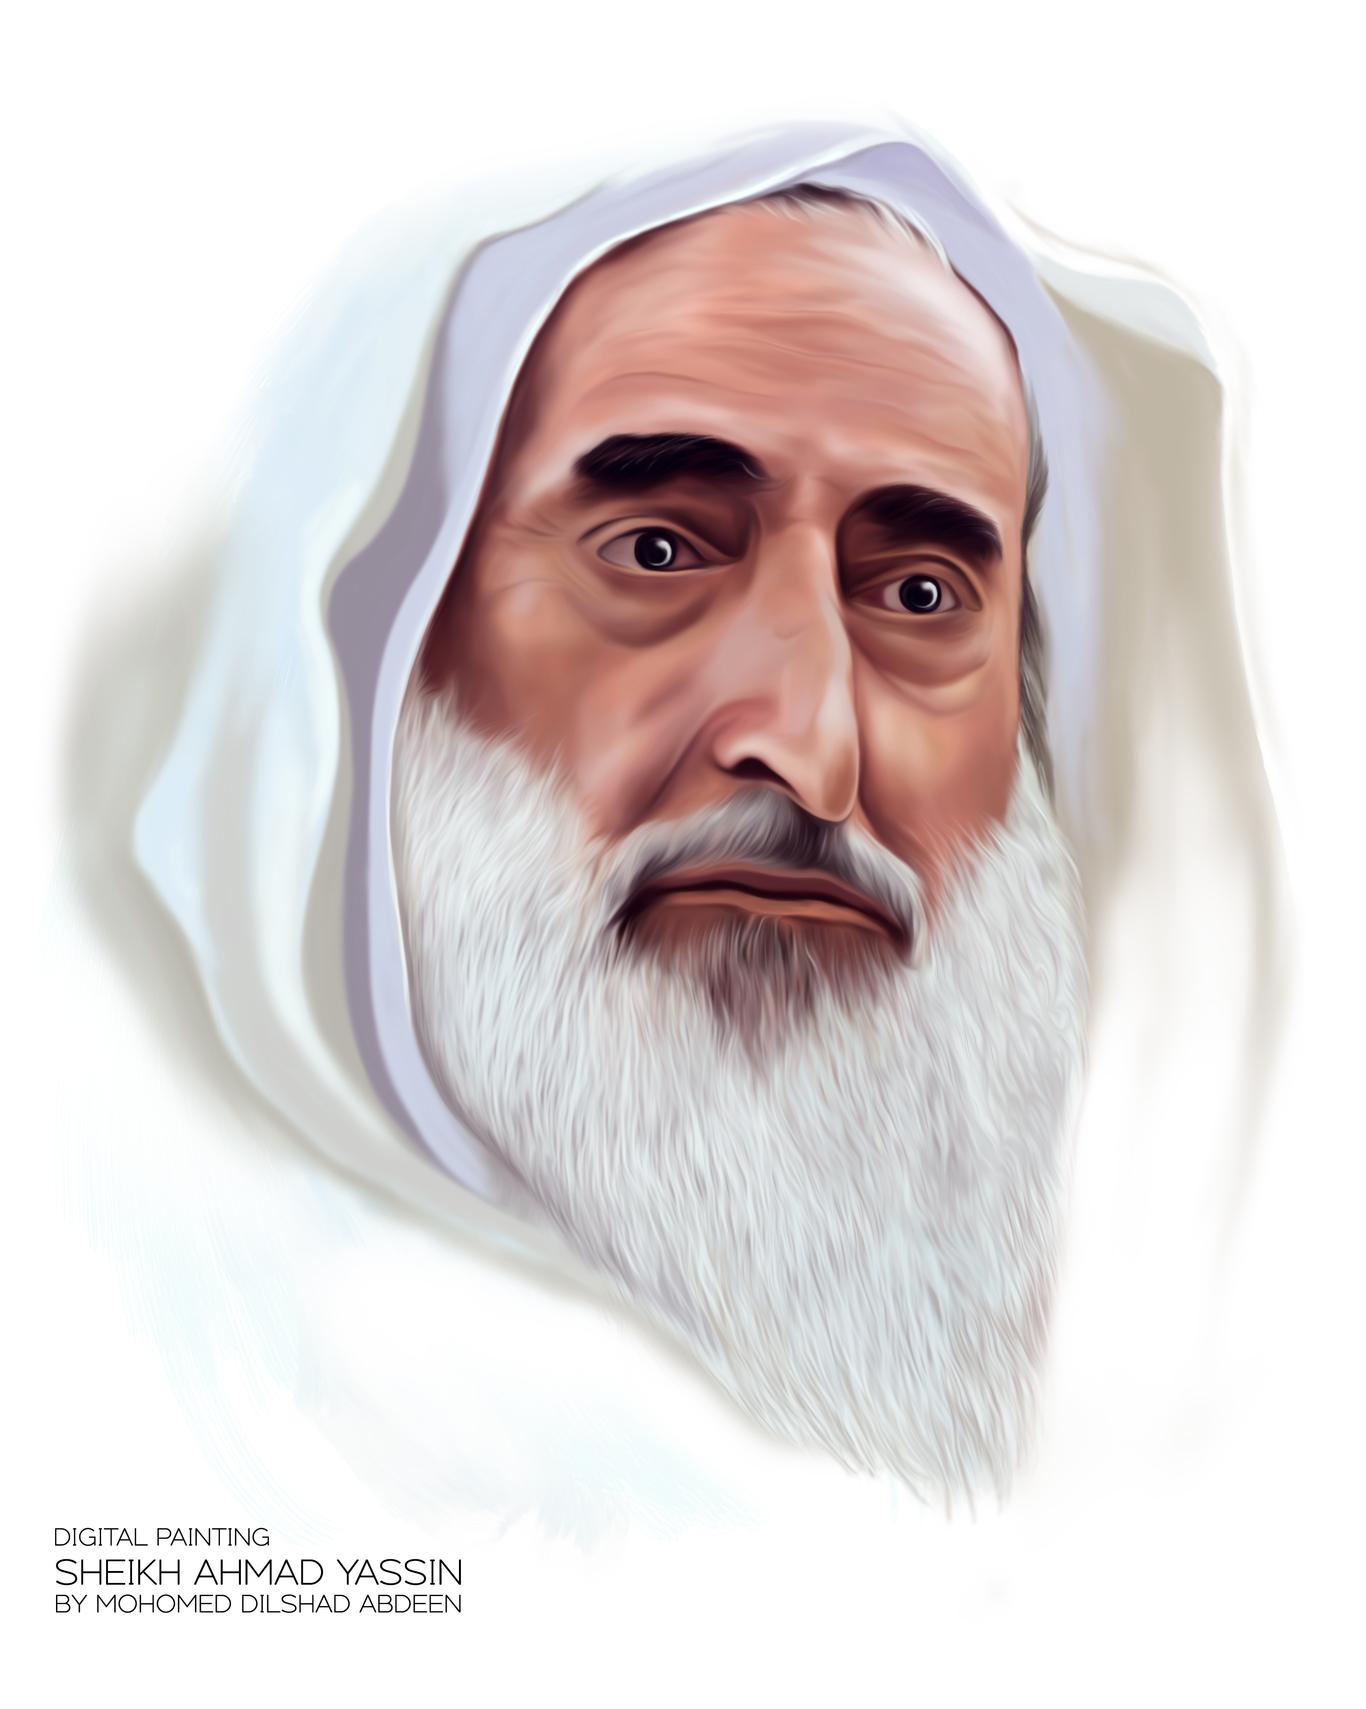 Dilshad 1263394 1 abe53d68 iryq